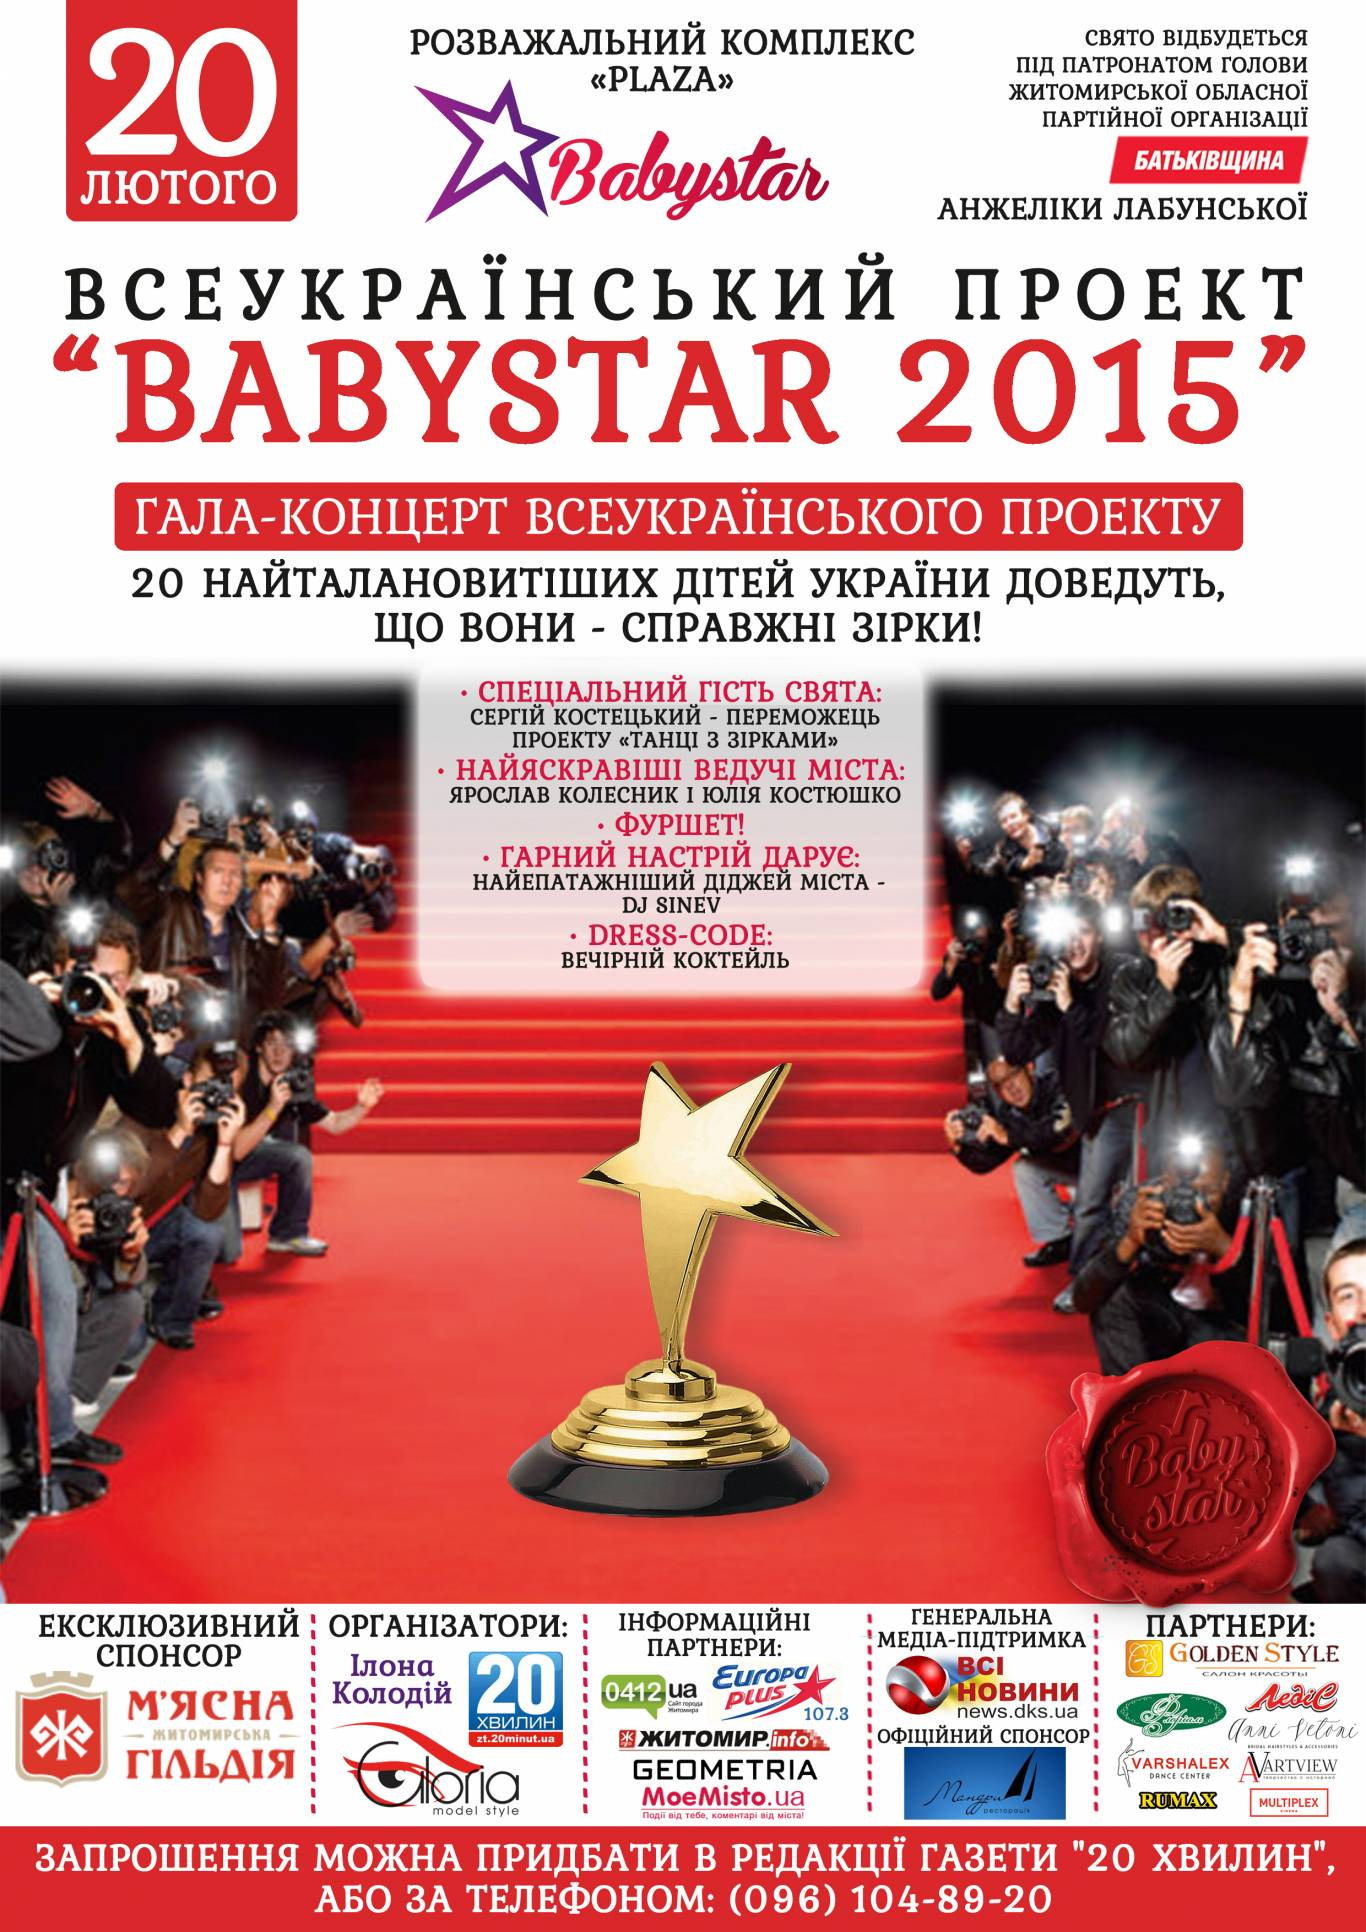 Фінал Всеукраїнського конкурсу BabyStar-2015